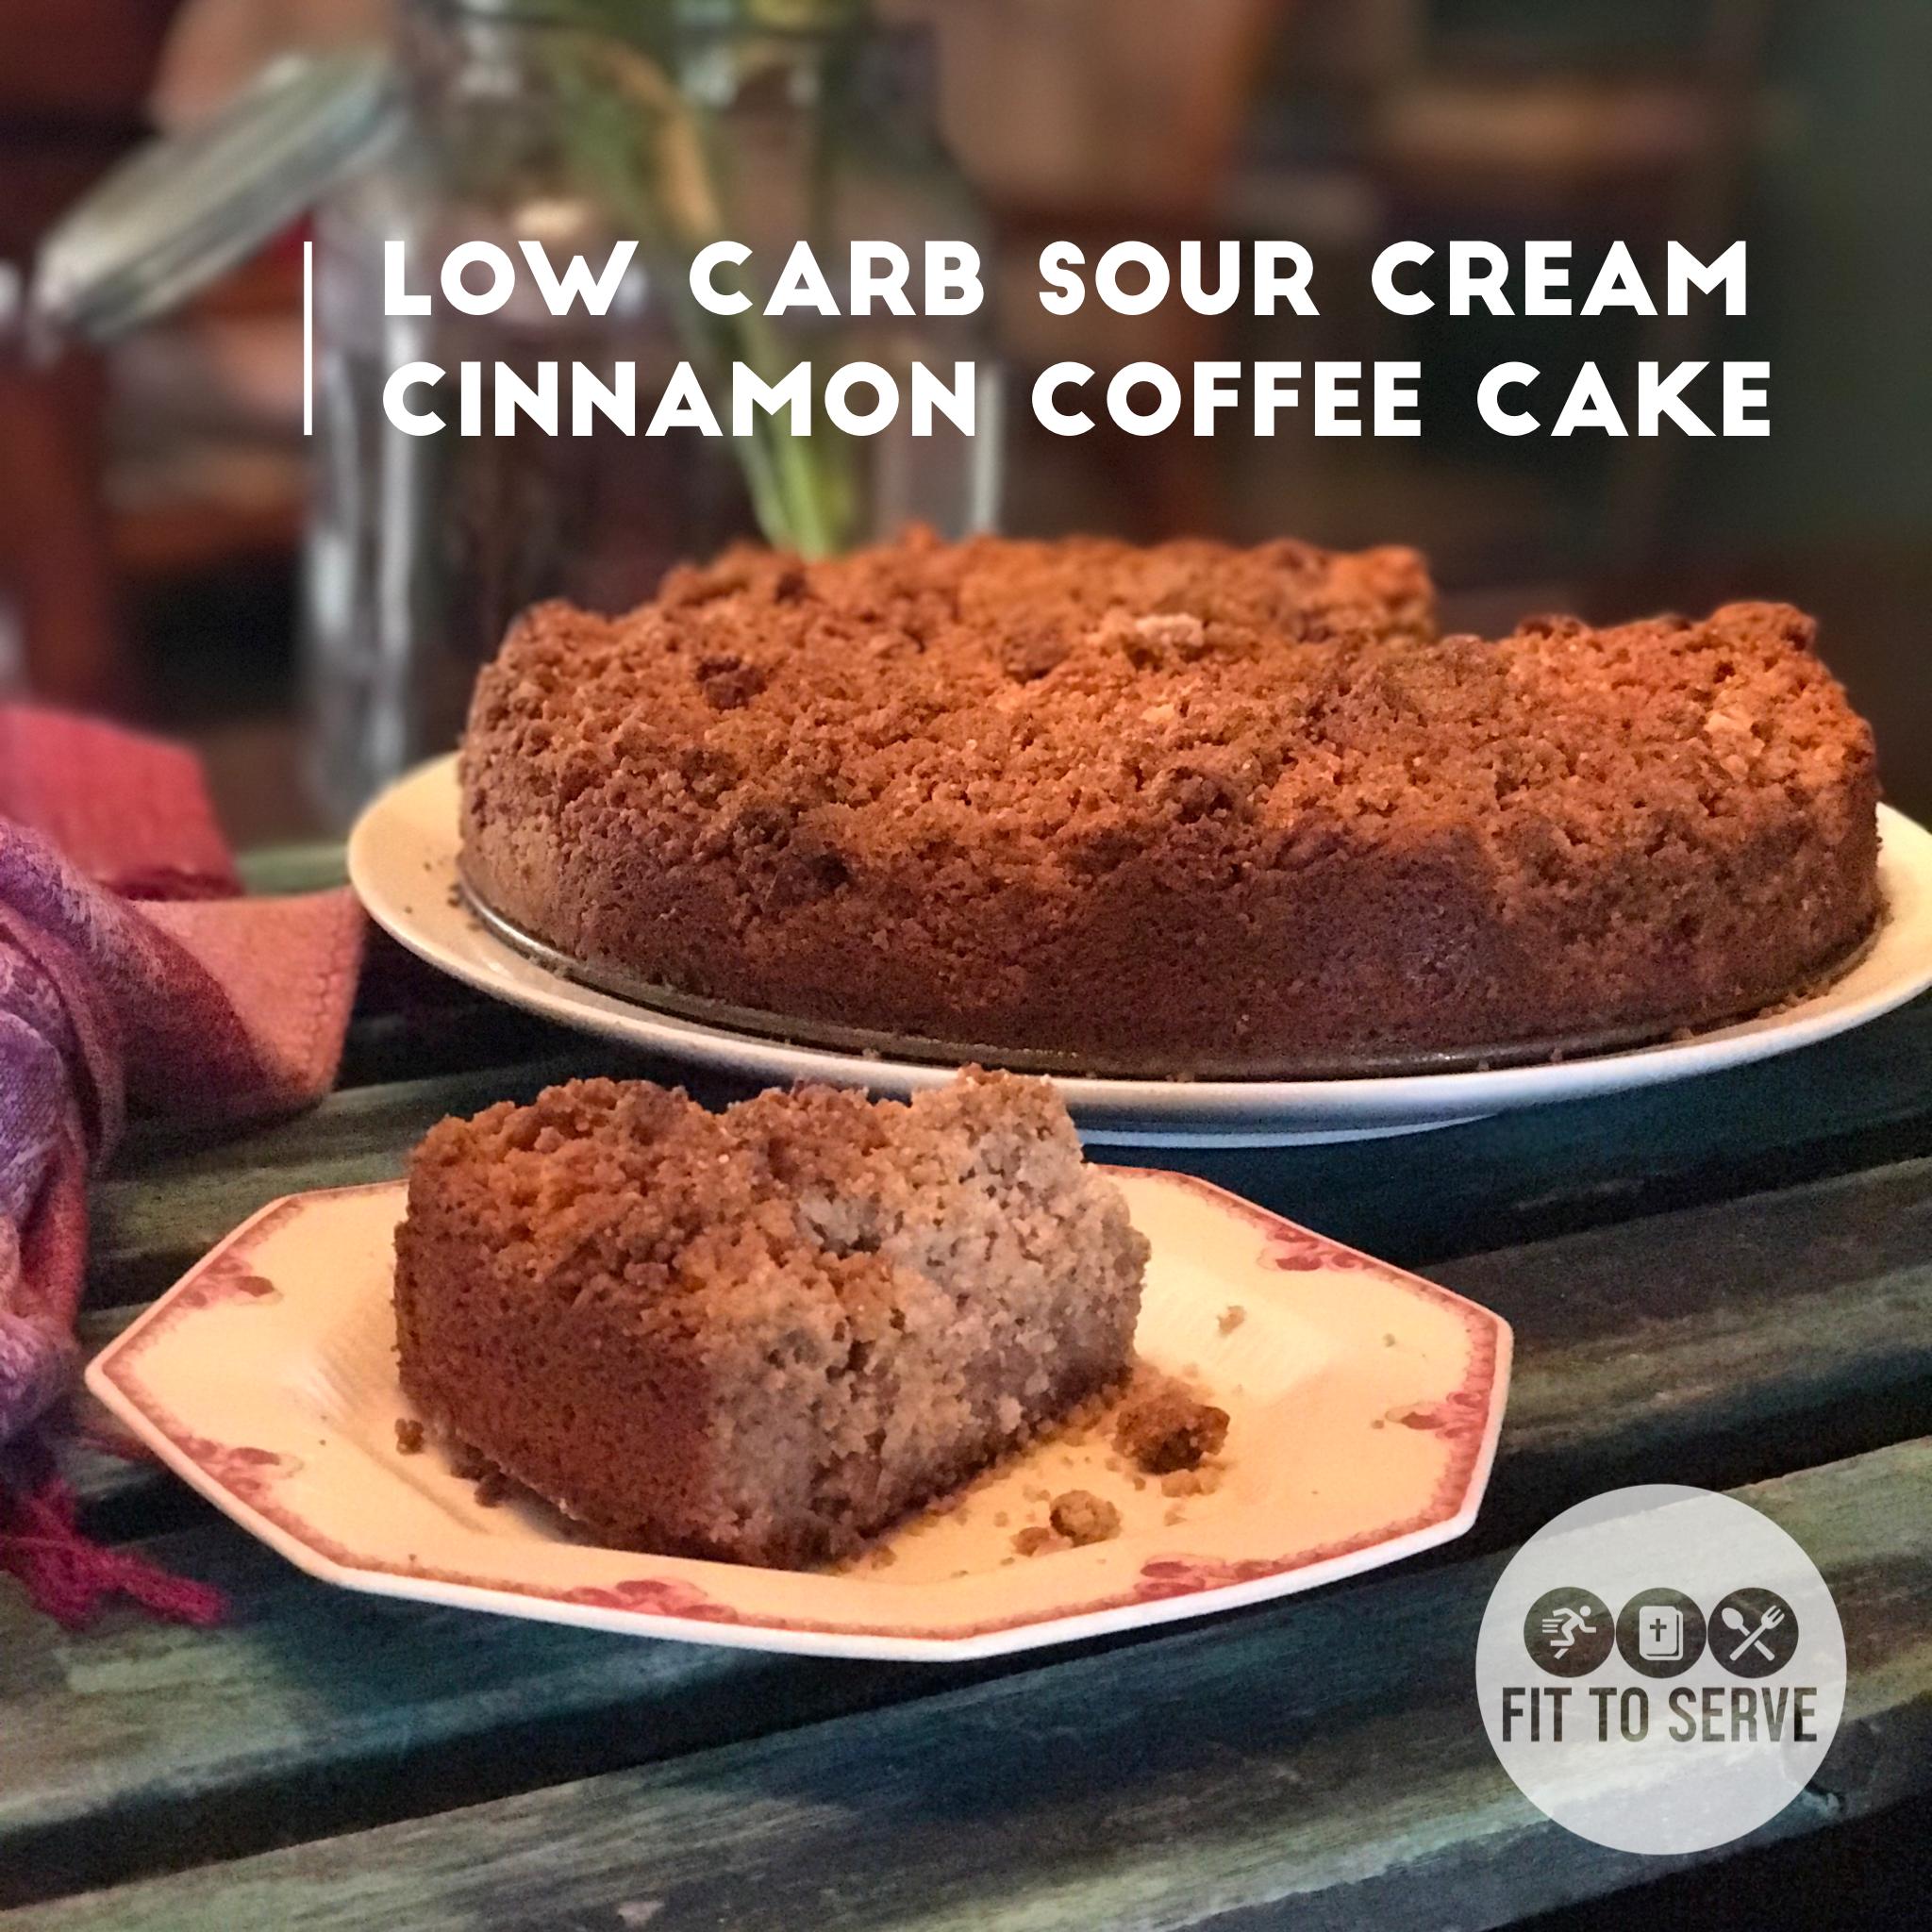 Low Fat Cinnamon Coffee Cake 7